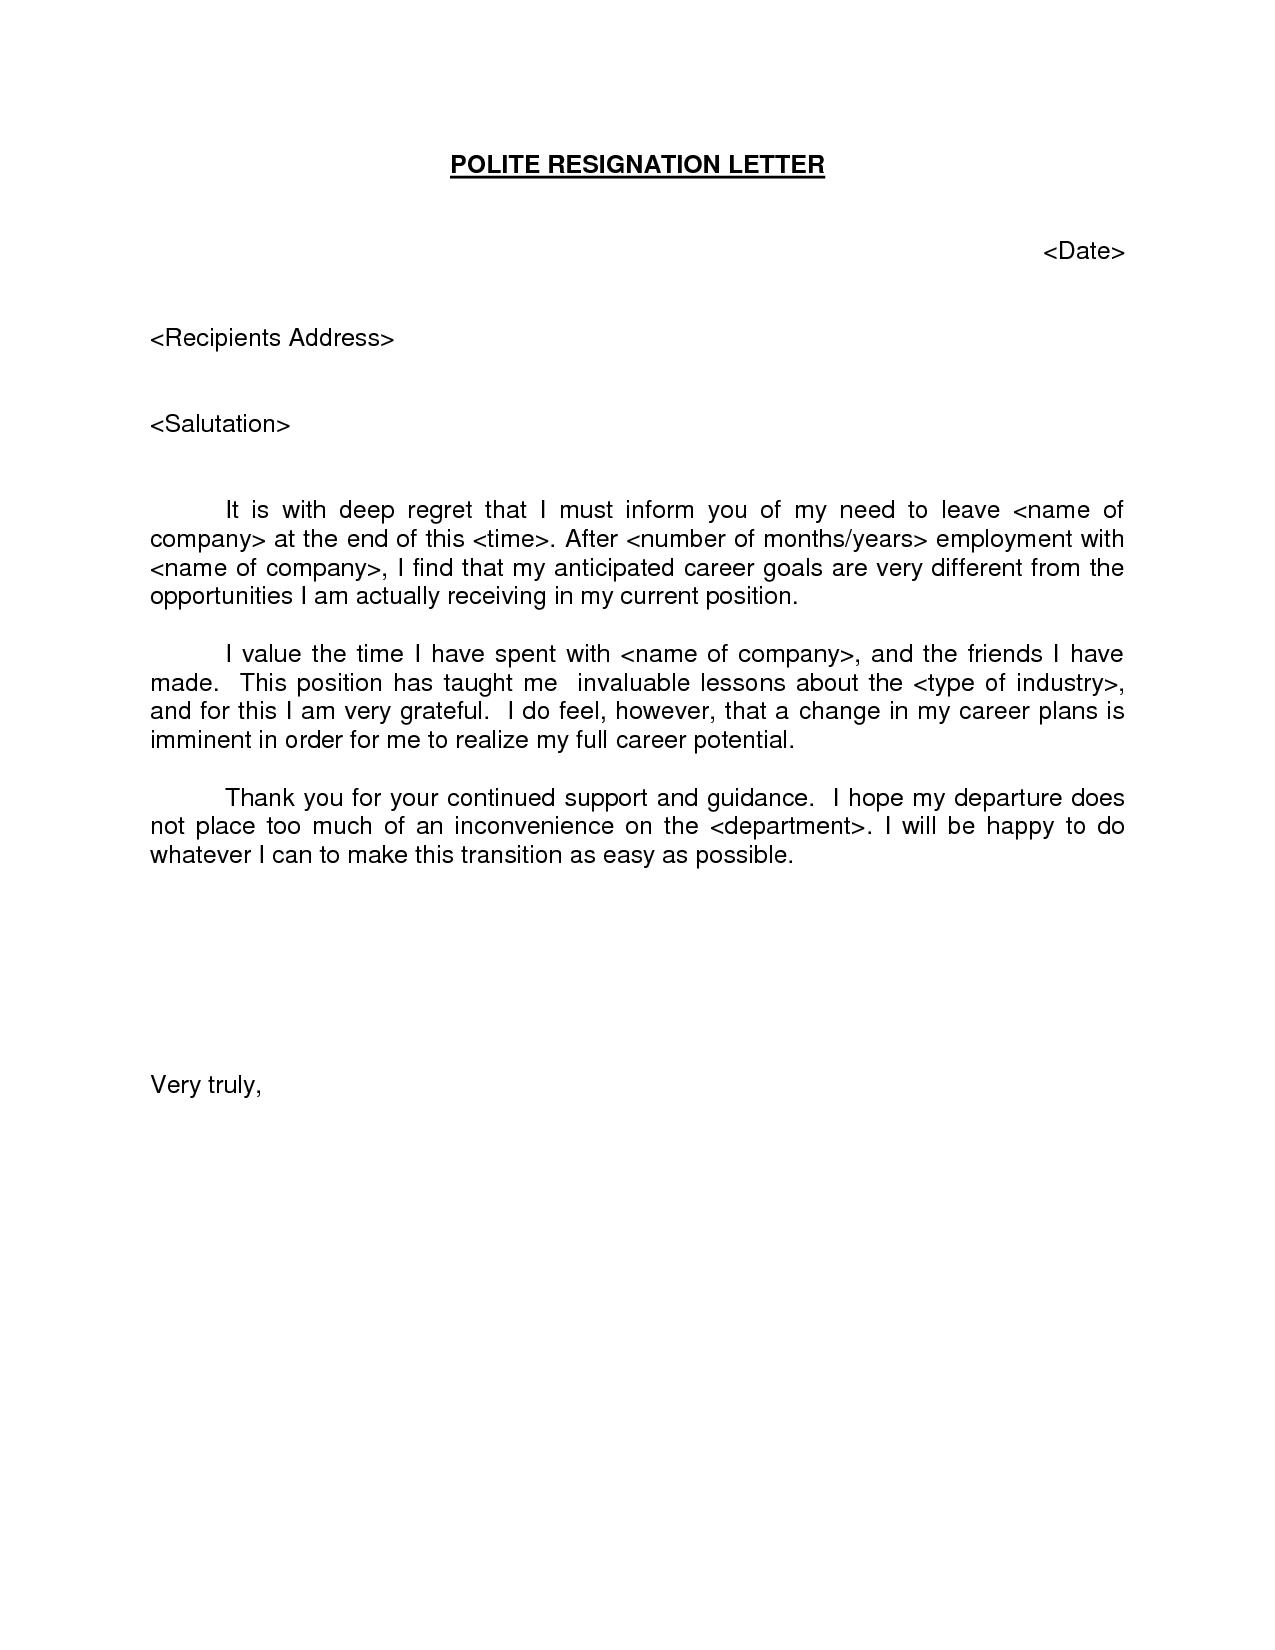 Letter Of Intent to Retire Template - Polite Resignation Letter Bestdealformoneywriting A Letter